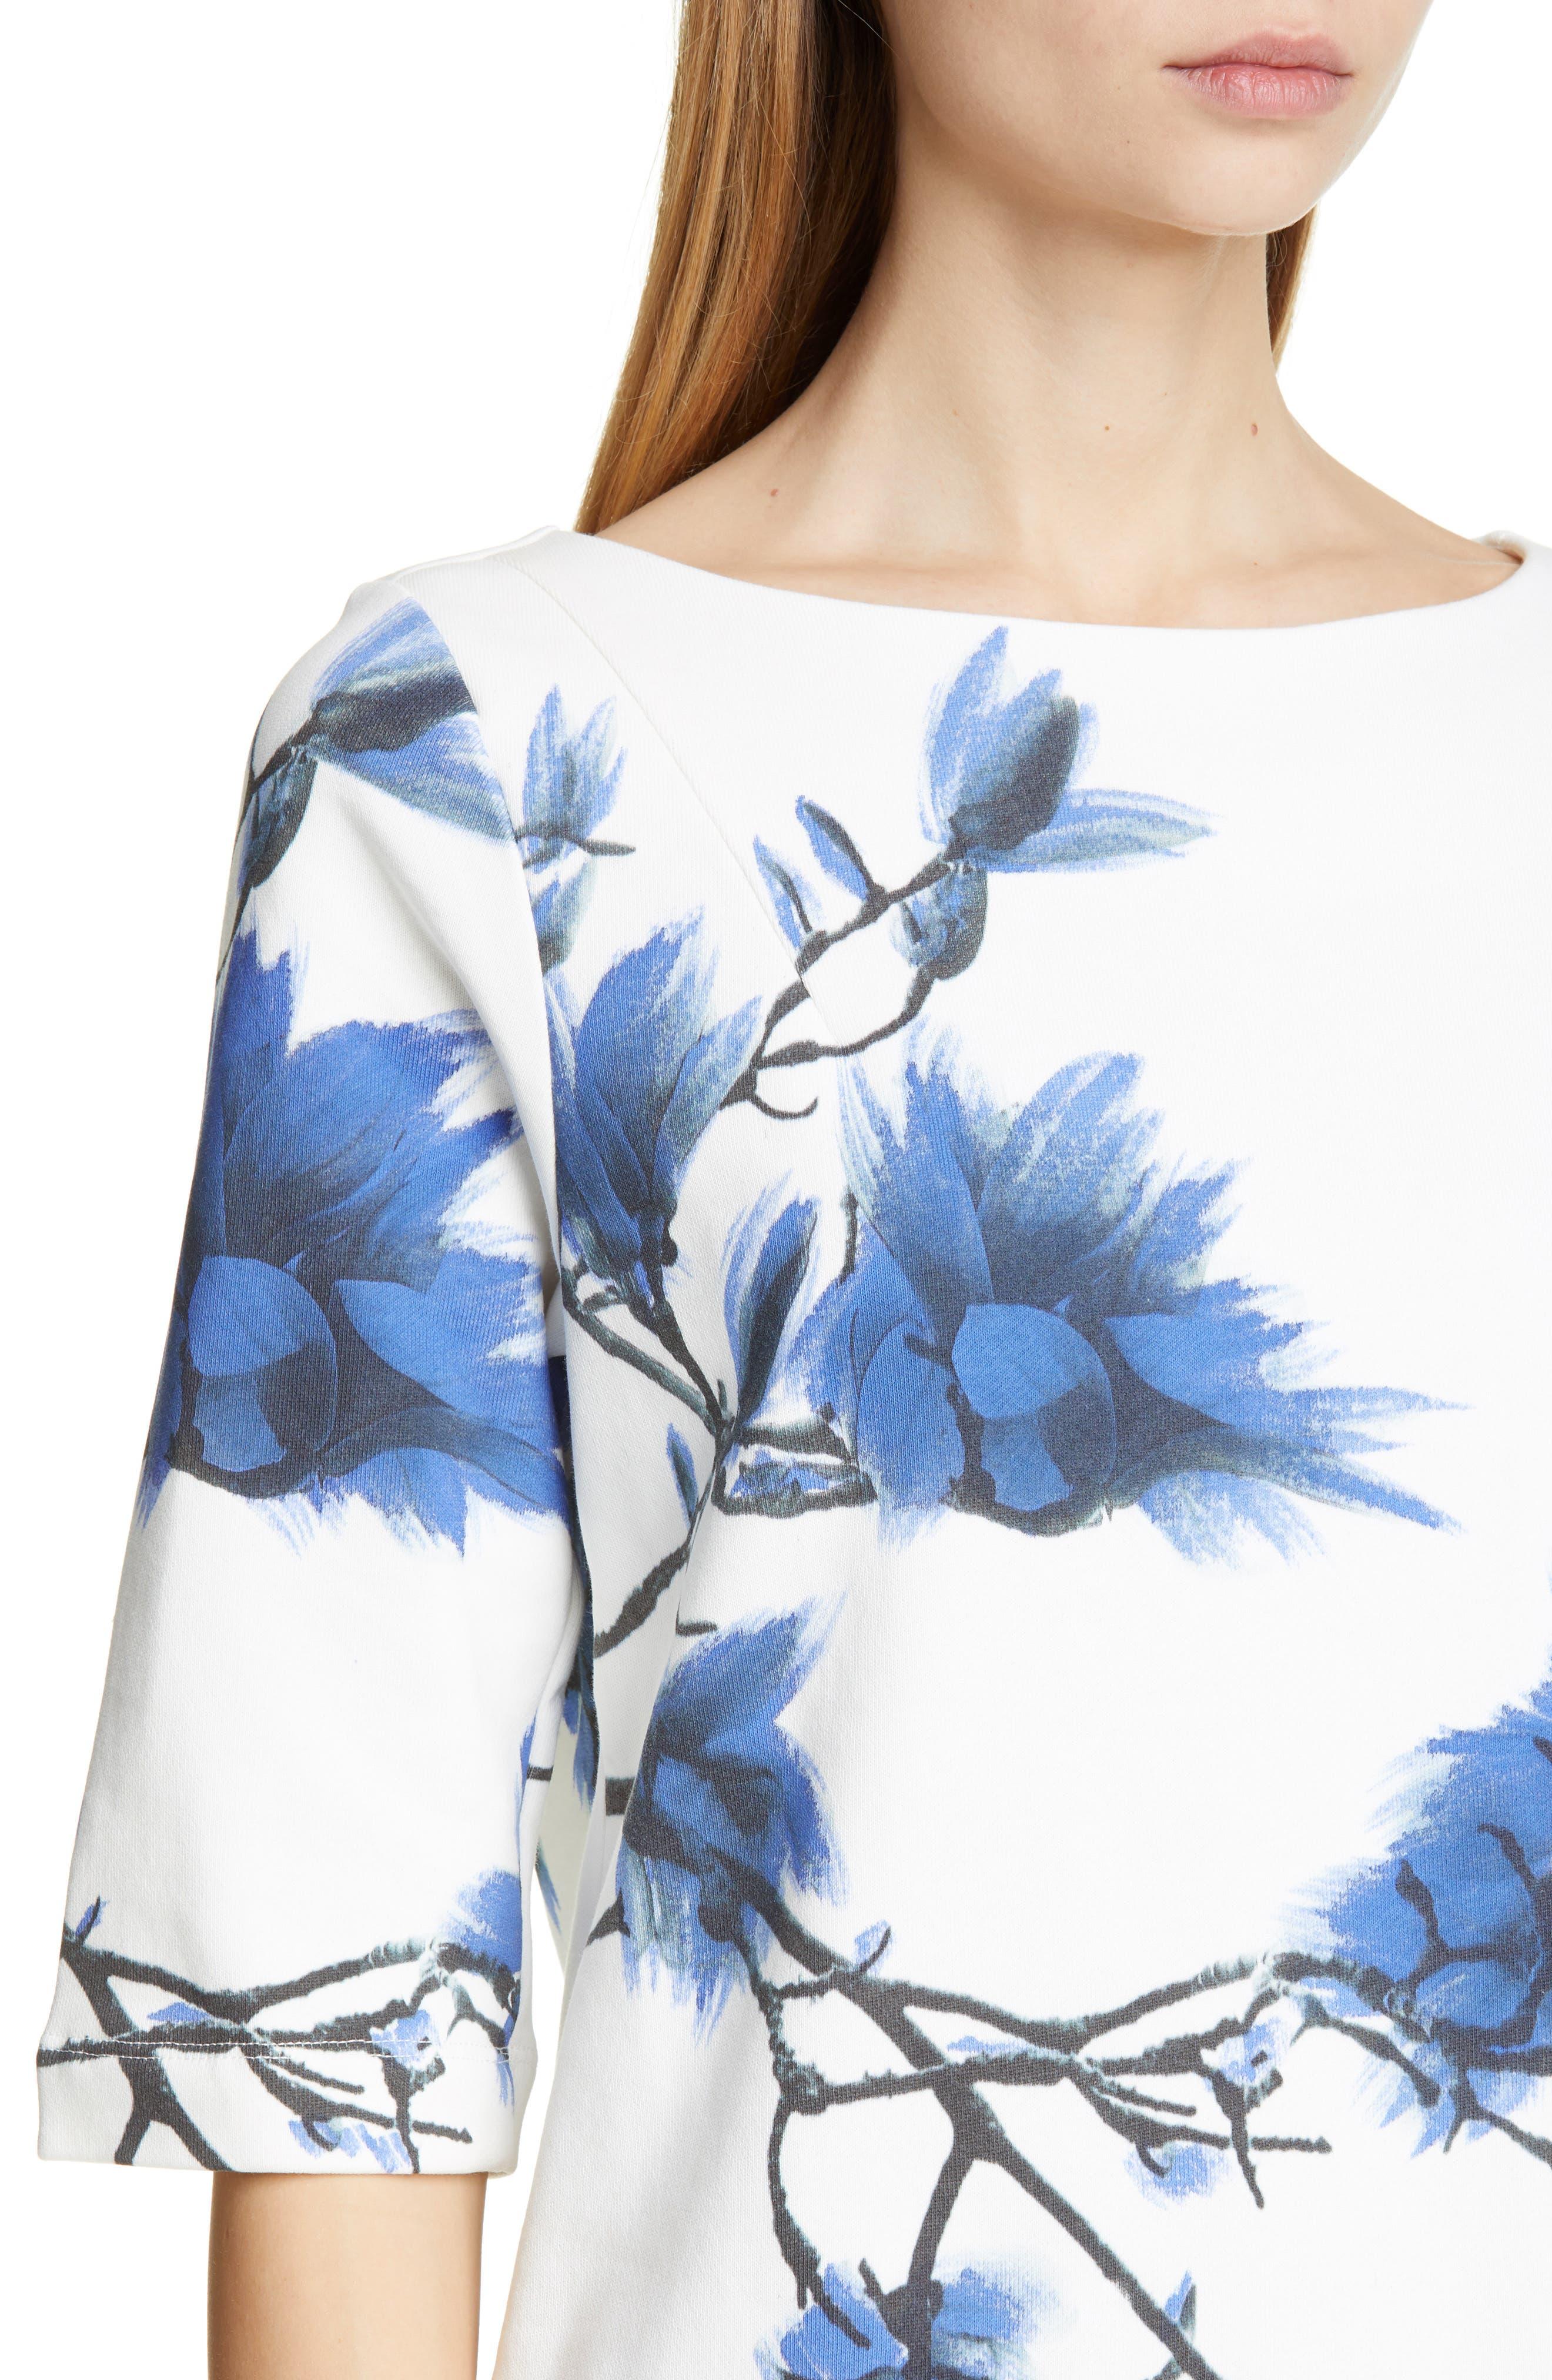 DRIES VAN NOTEN, Haendel Hand Painted Floral Top, Alternate thumbnail 4, color, BLACK